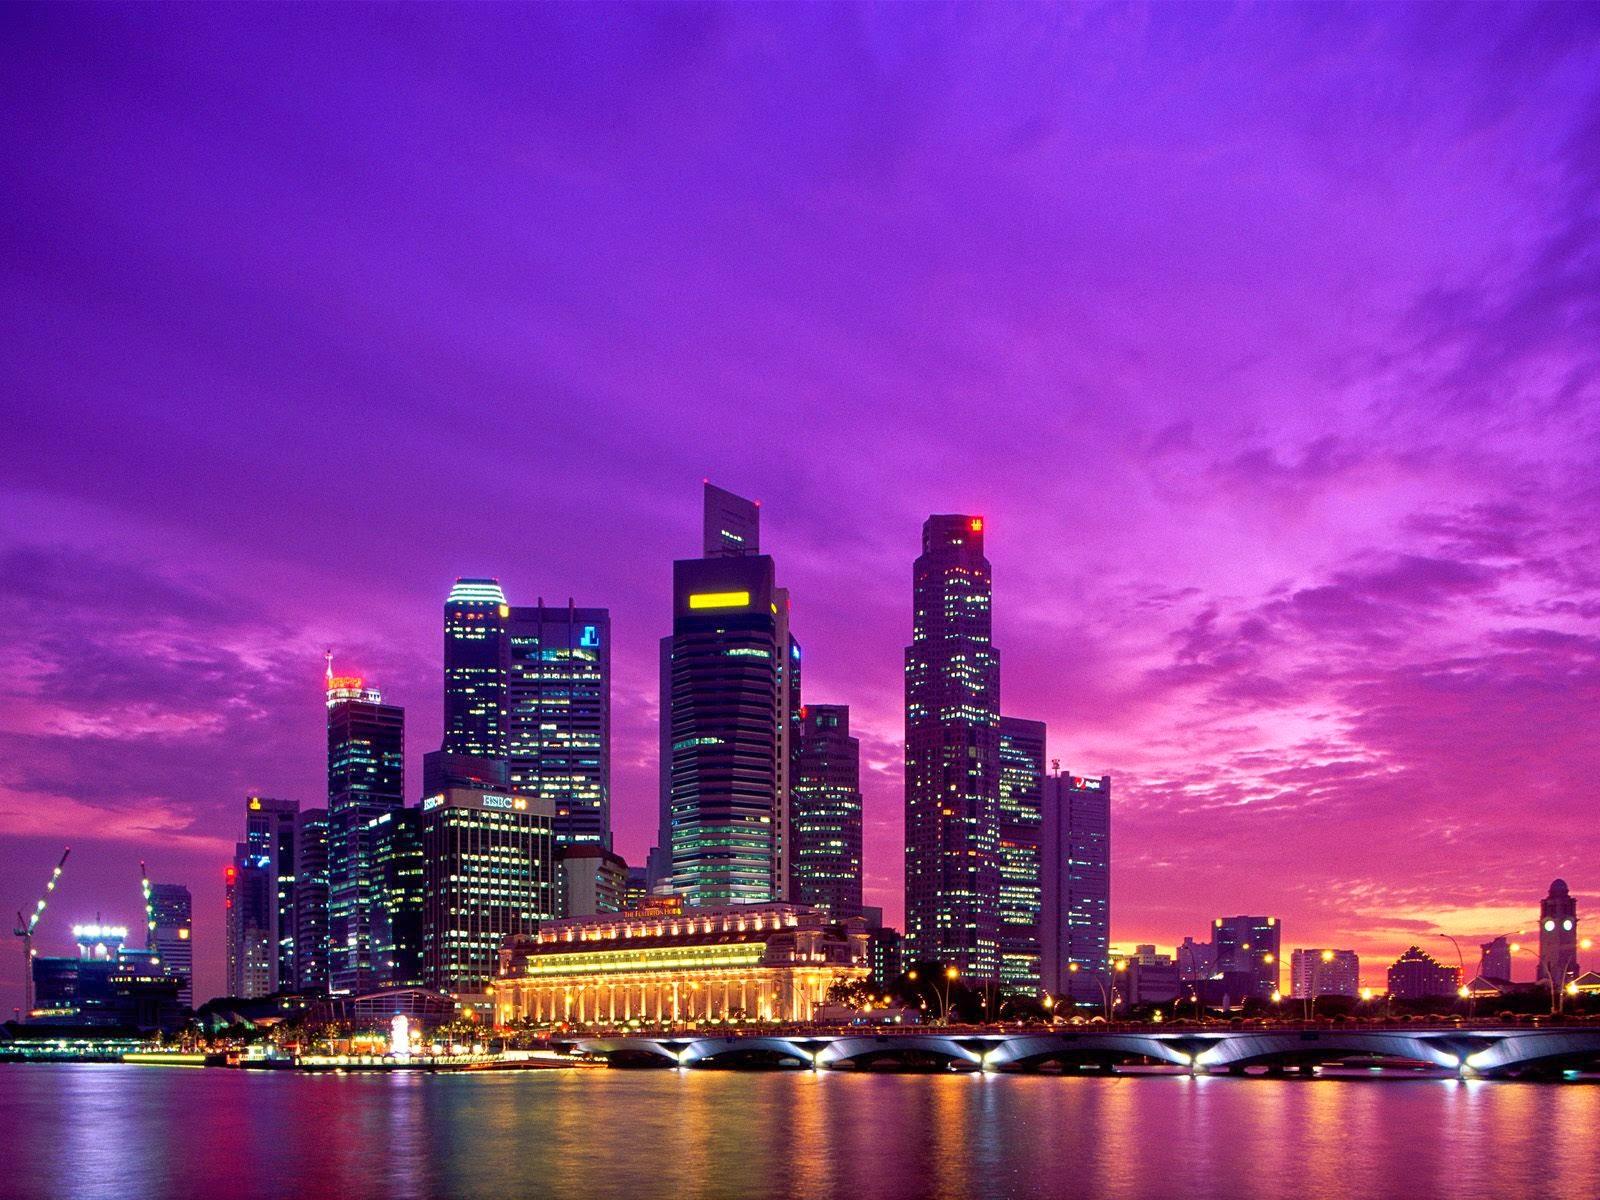 hd city skyline panorama scene wallpaper 2015 ~ besthdwallpapers2